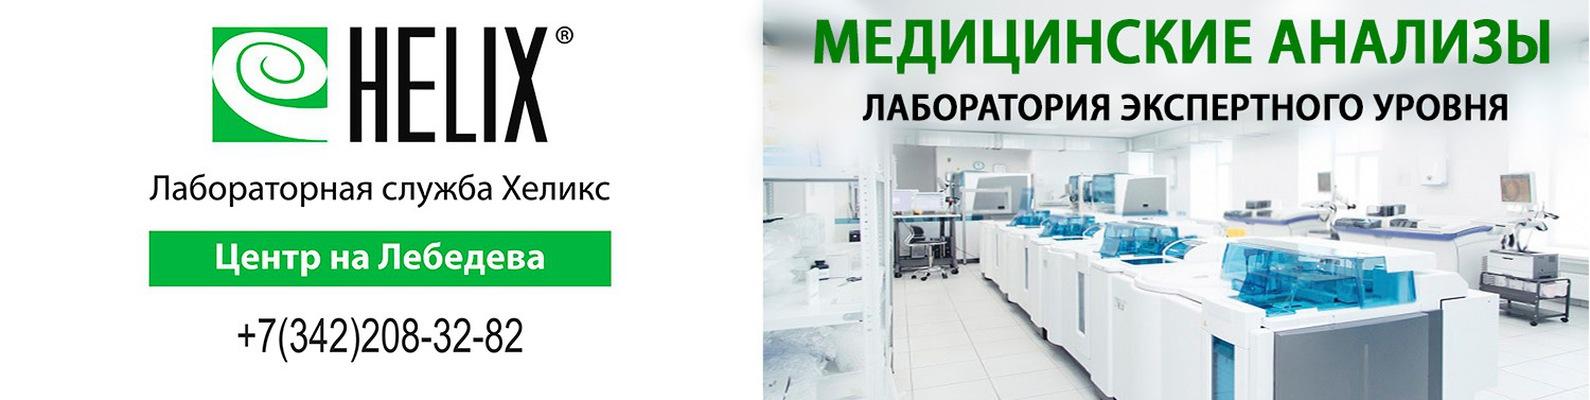 Лаборатория хеликс сперма